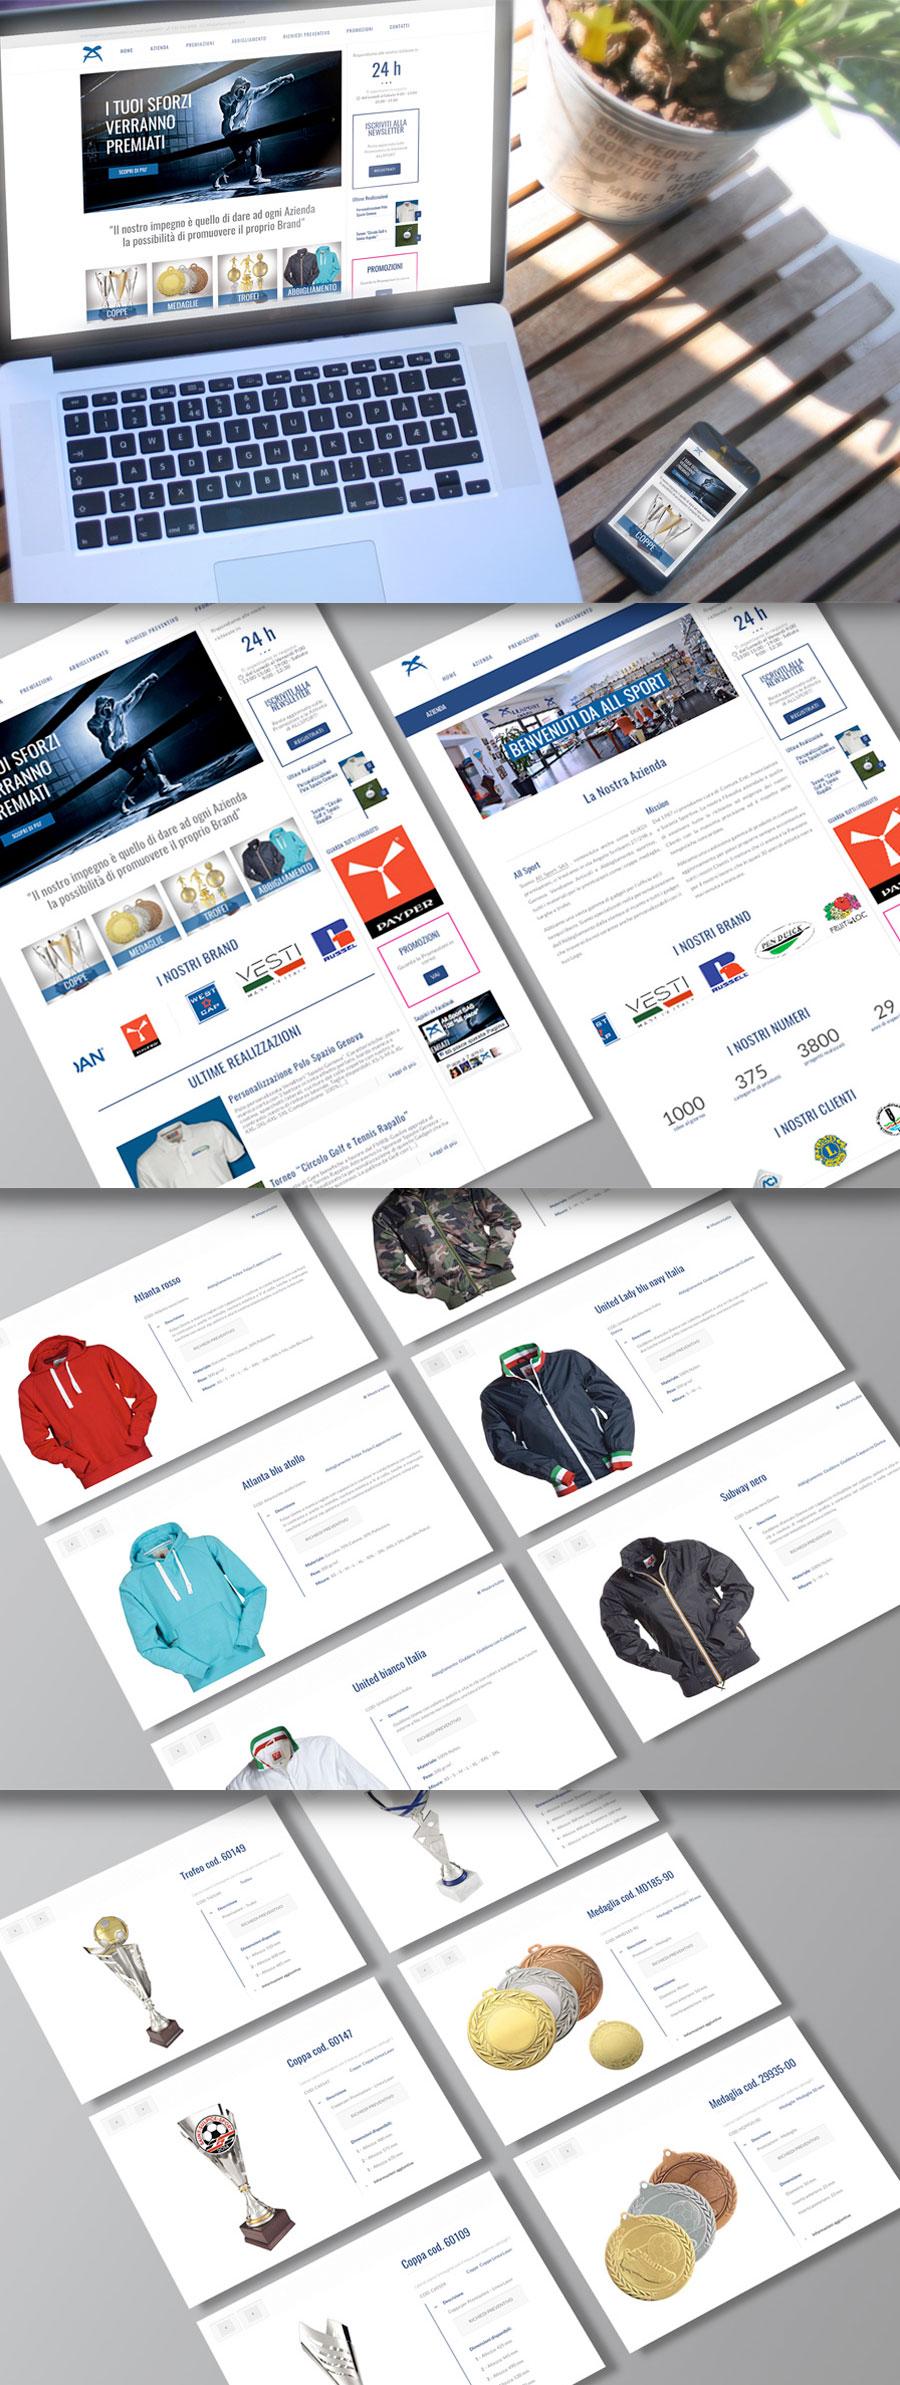 belink-design-sito-web-ecommerce-responsive-allsport